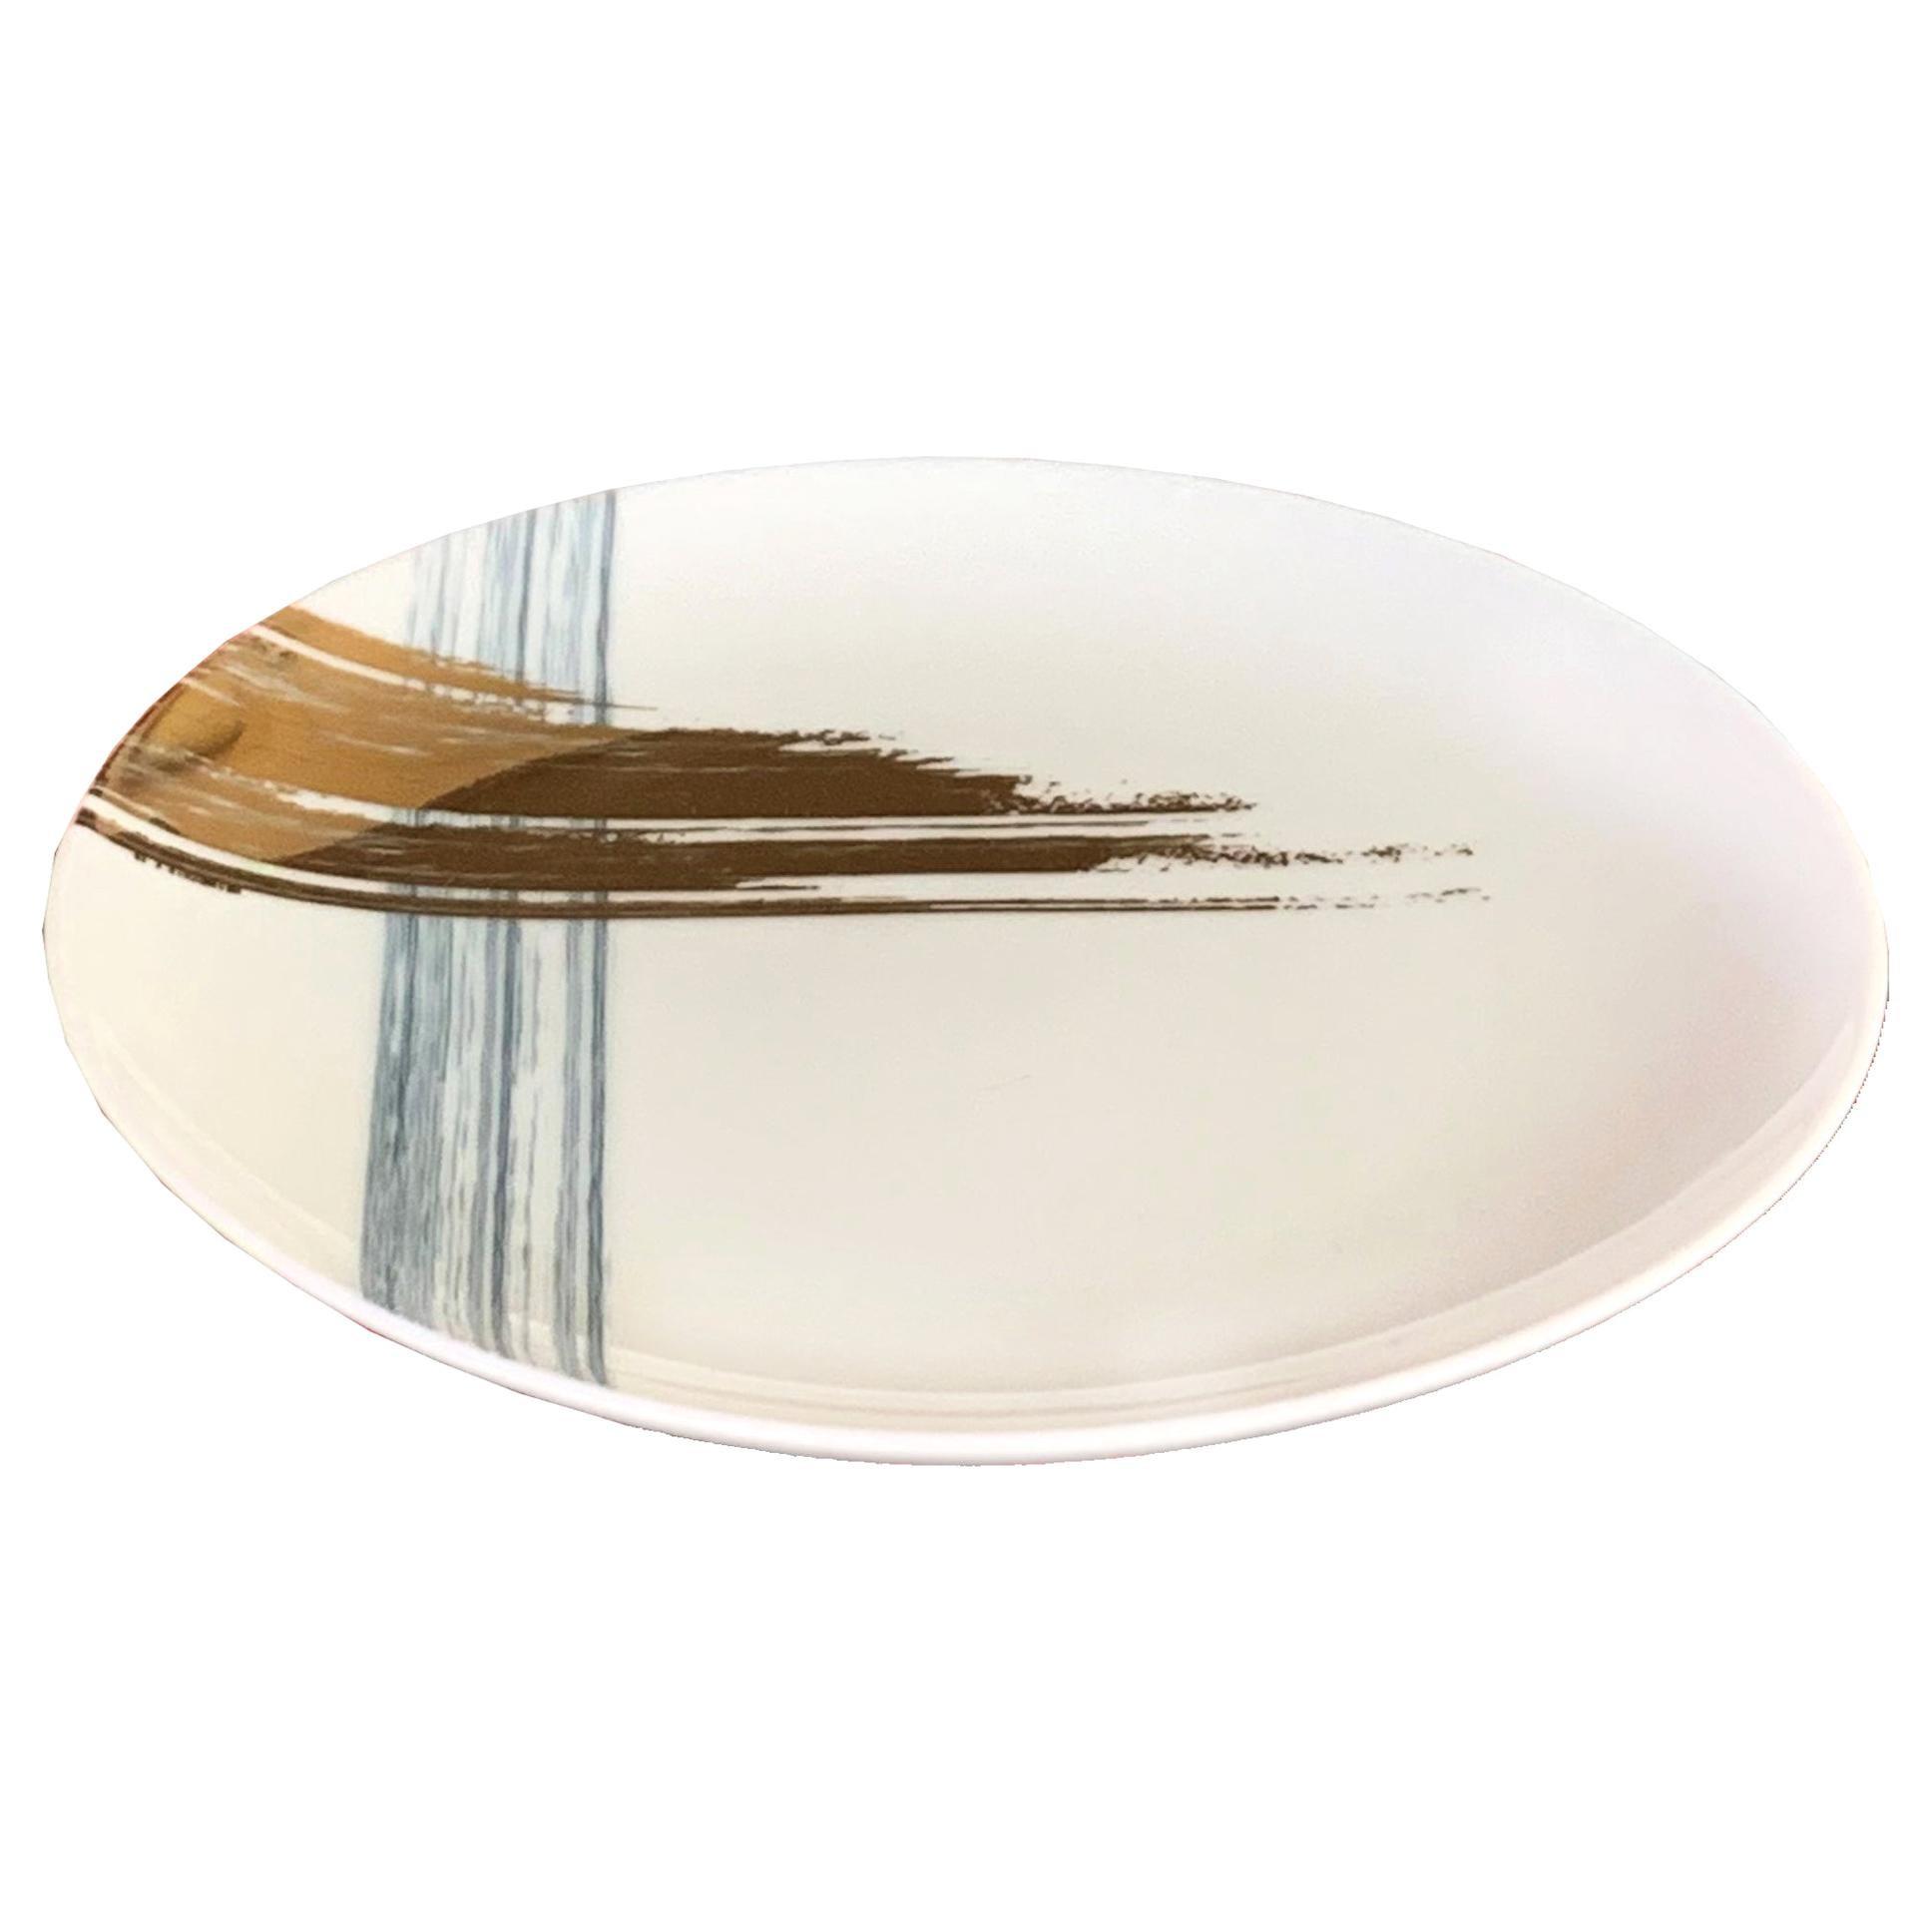 Set of 2 Fruit Plate Artisan Brush André Fu Living Tableware New